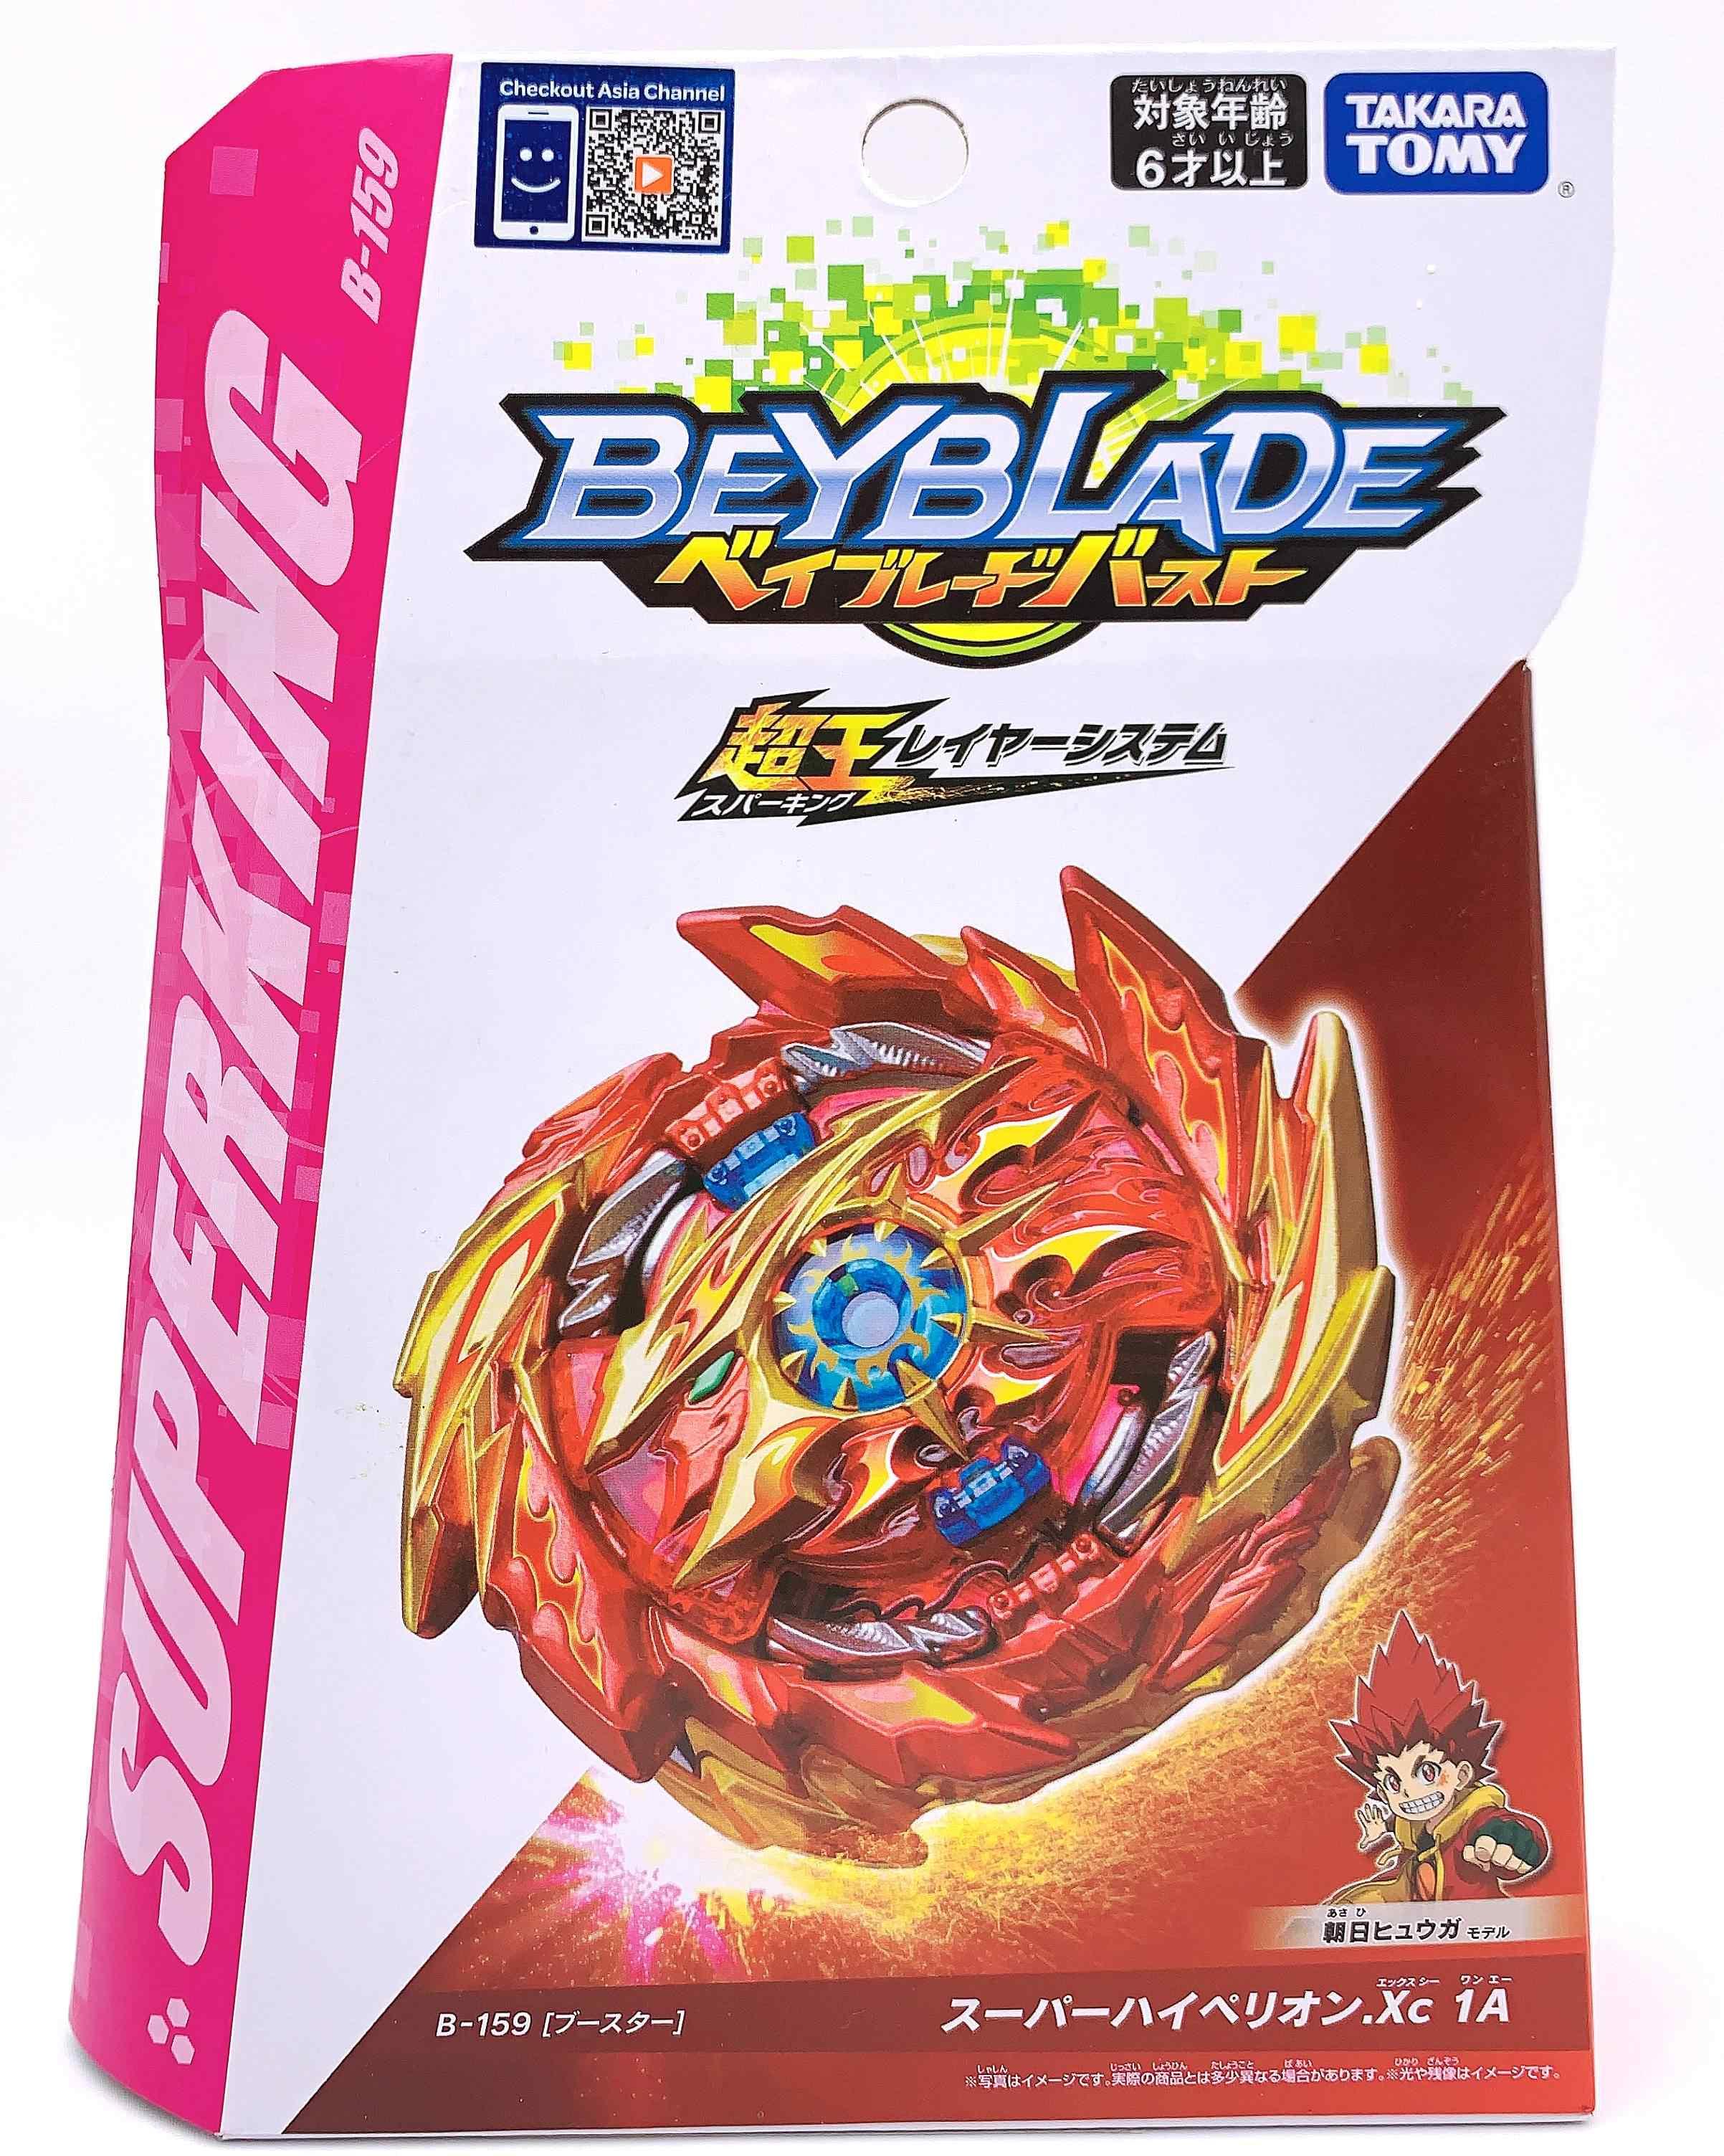 Beyblade Burst GT B-159 Super Hyperion Booster Nuevo Sin lanzador Toys